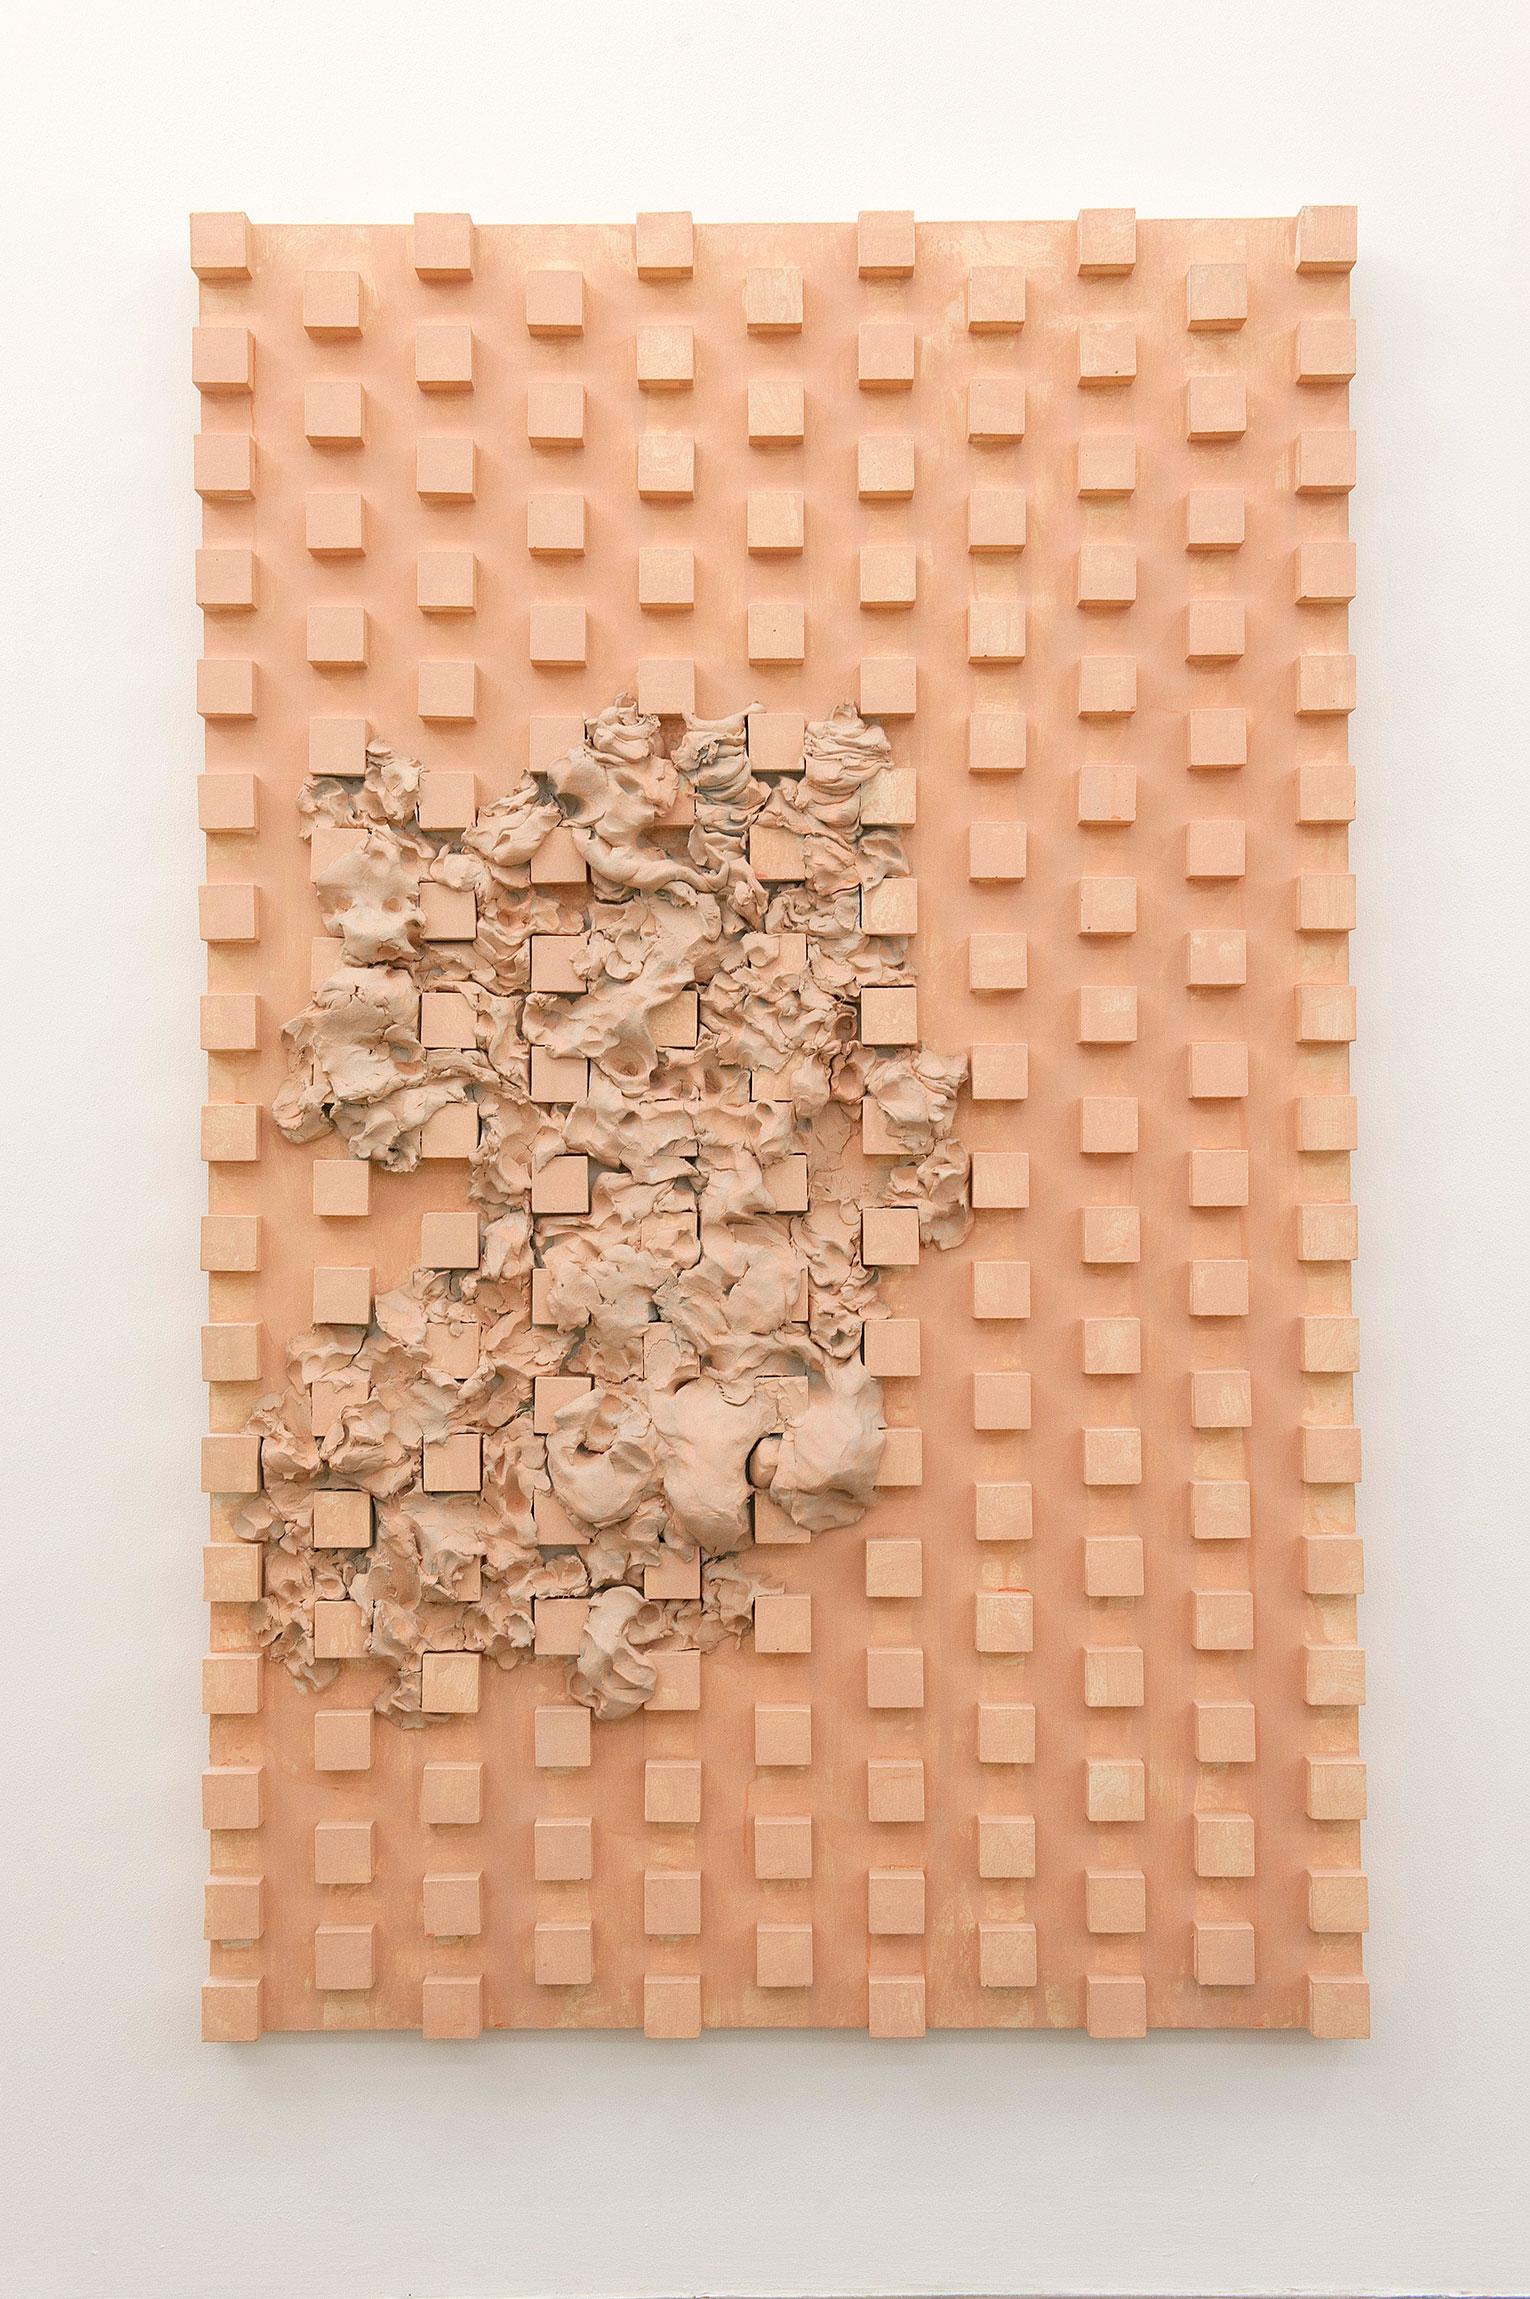 <b>Title:&nbsp;</b>Untitled<br /><b>Year:&nbsp;</b>2011<br /><b>Medium:&nbsp;</b>Plaster, air-drying clay, acrylic<br /><b>Size:&nbsp;</b>132 x 84 cm